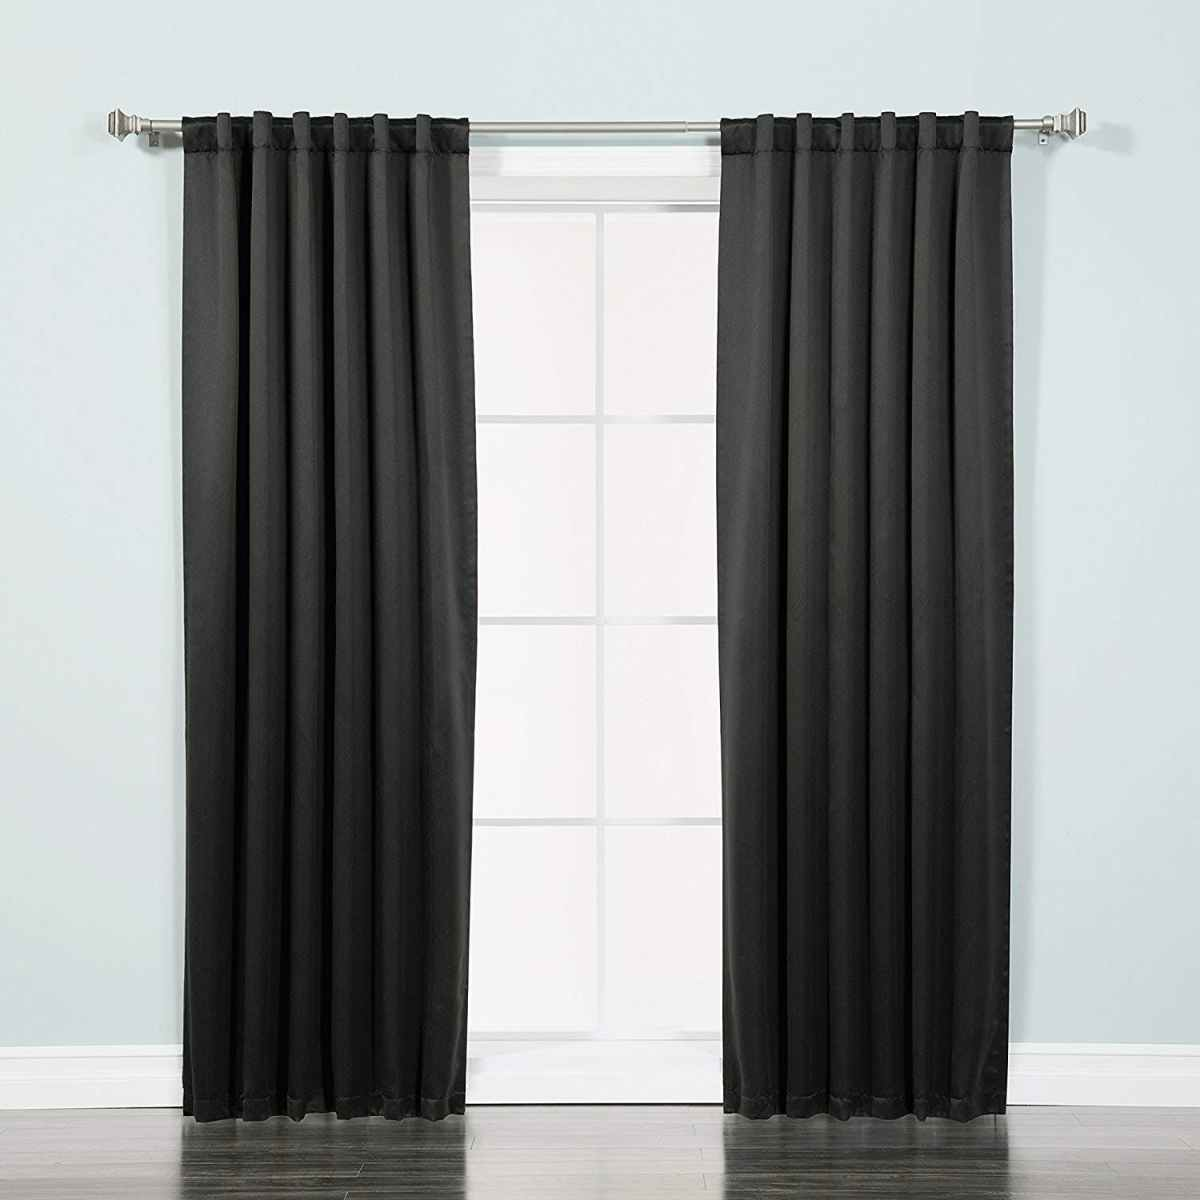 black out curtains, blackout curtains